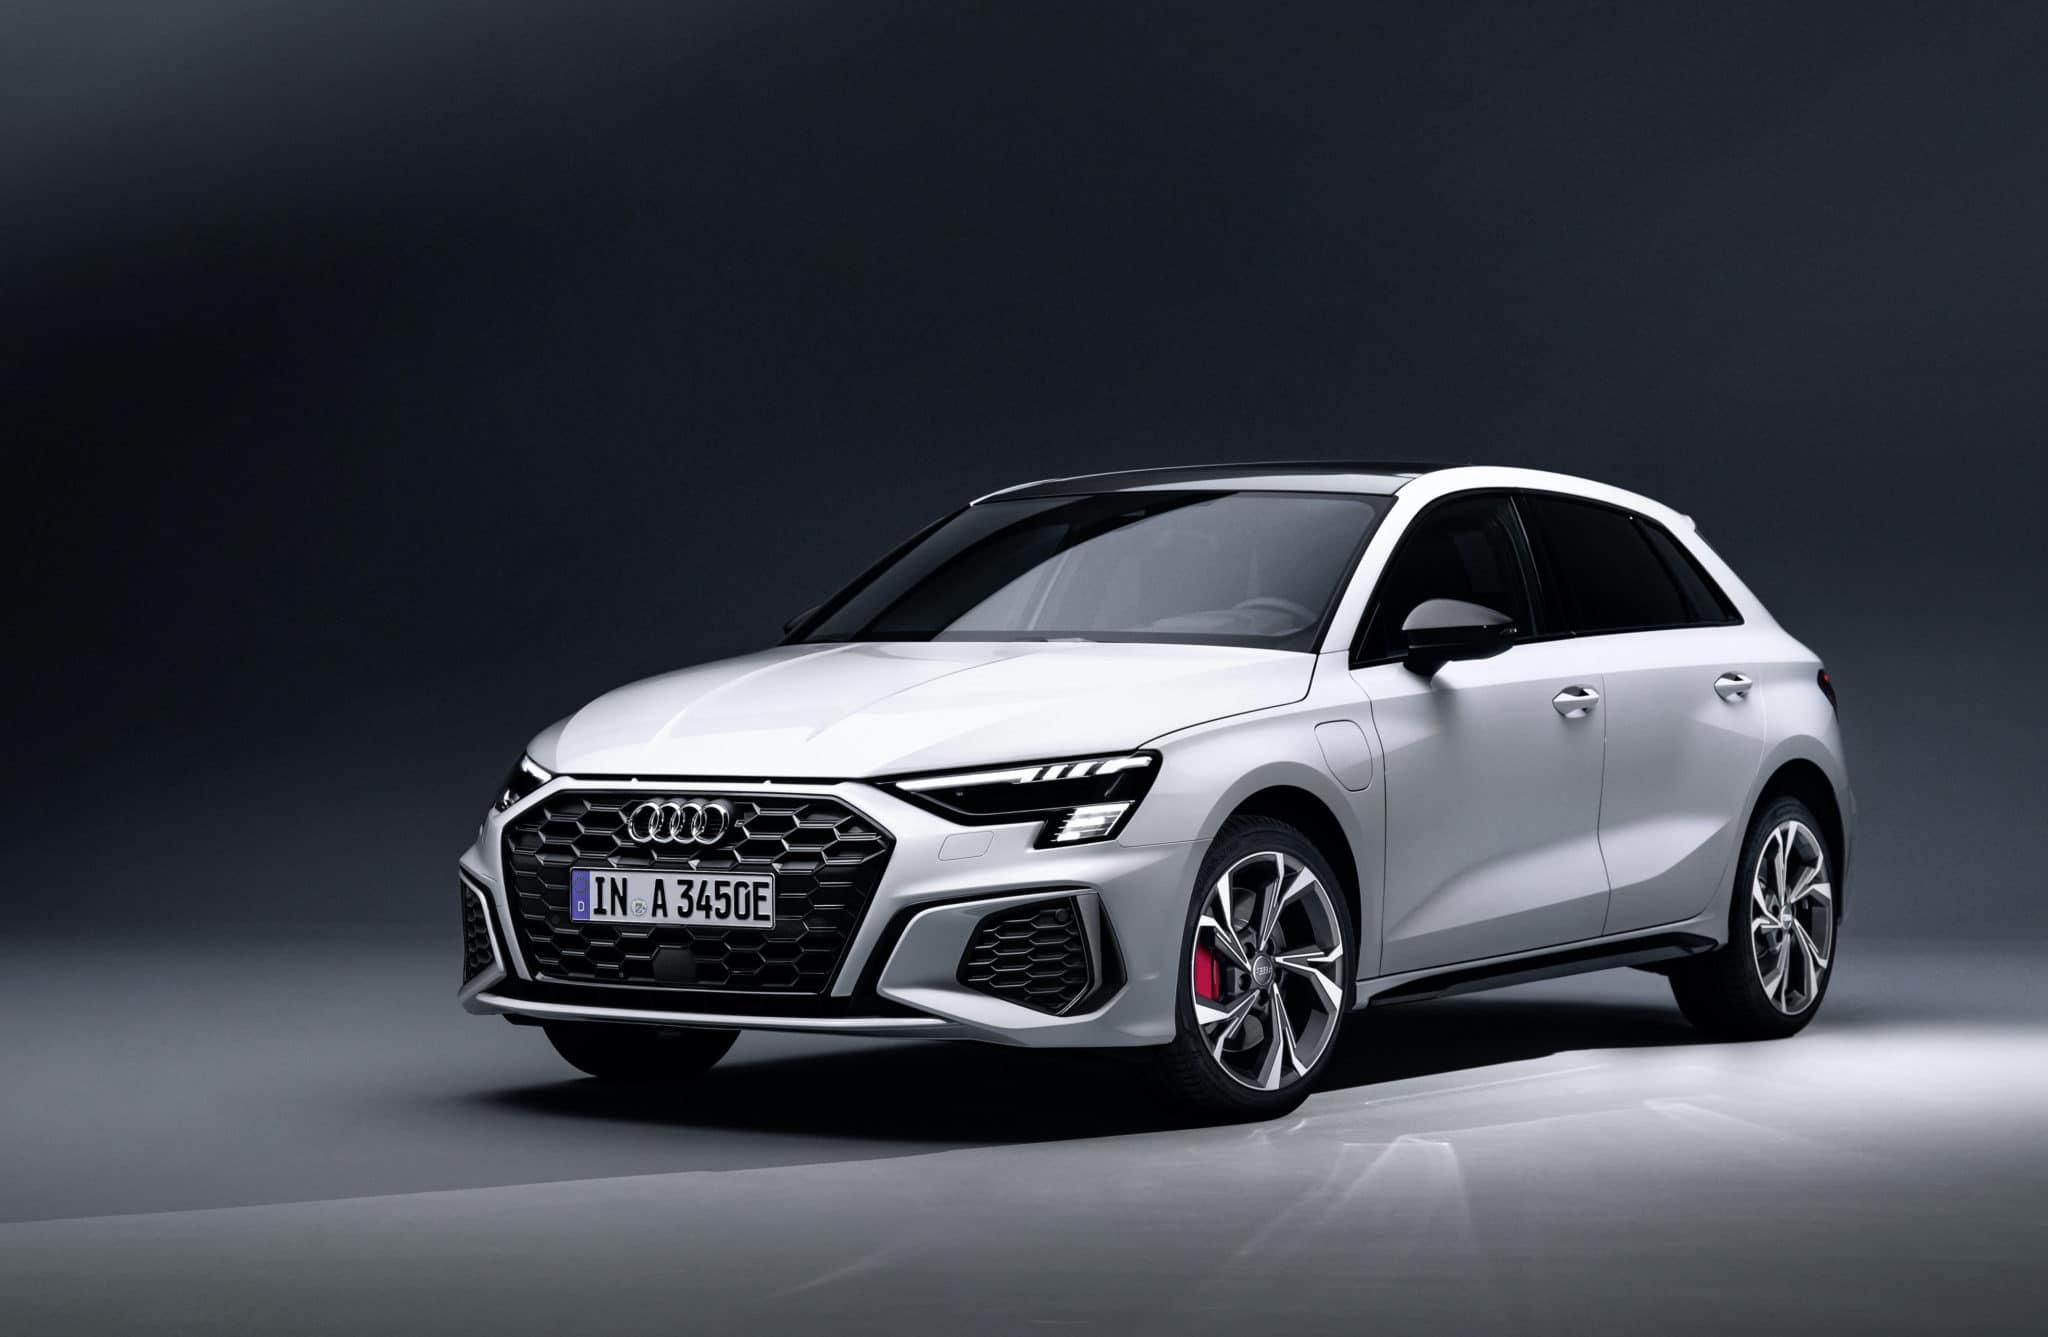 Audi A3 Sportback 45 TFSI e Plug-in-Hybrid